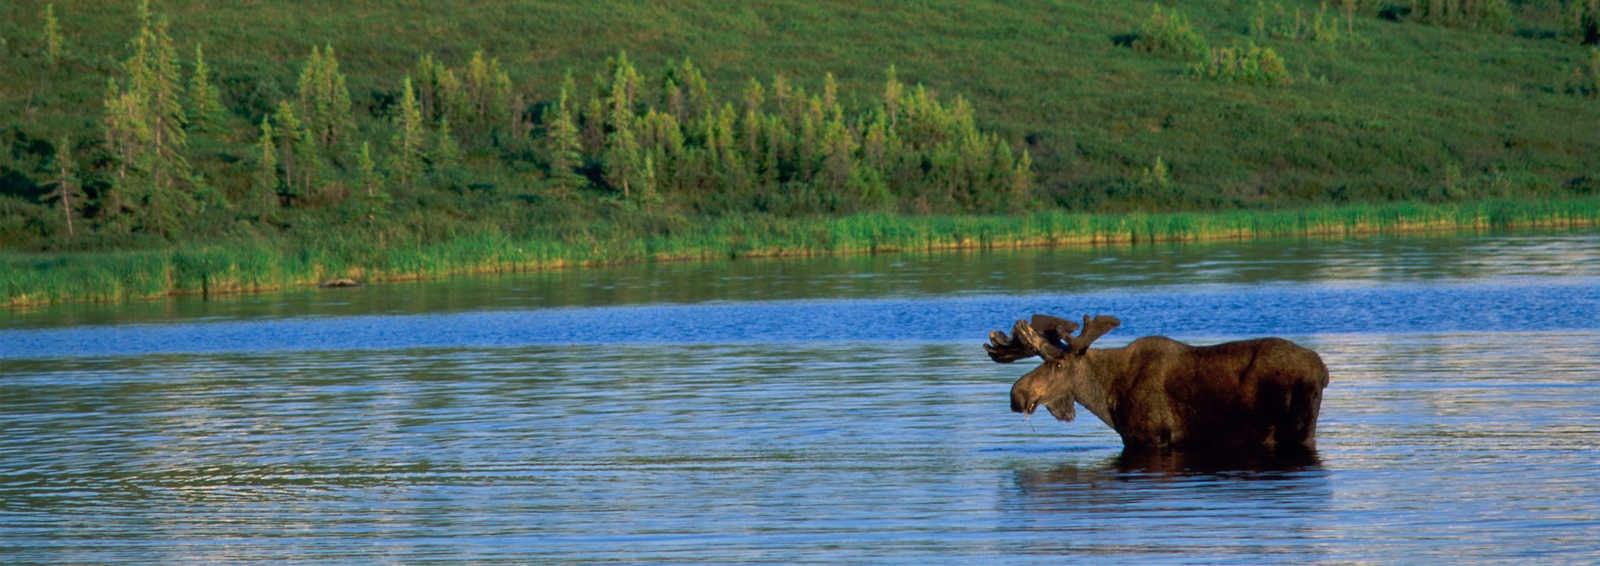 Moose, Wonder Lake, Denali National Park, Alaska, USA